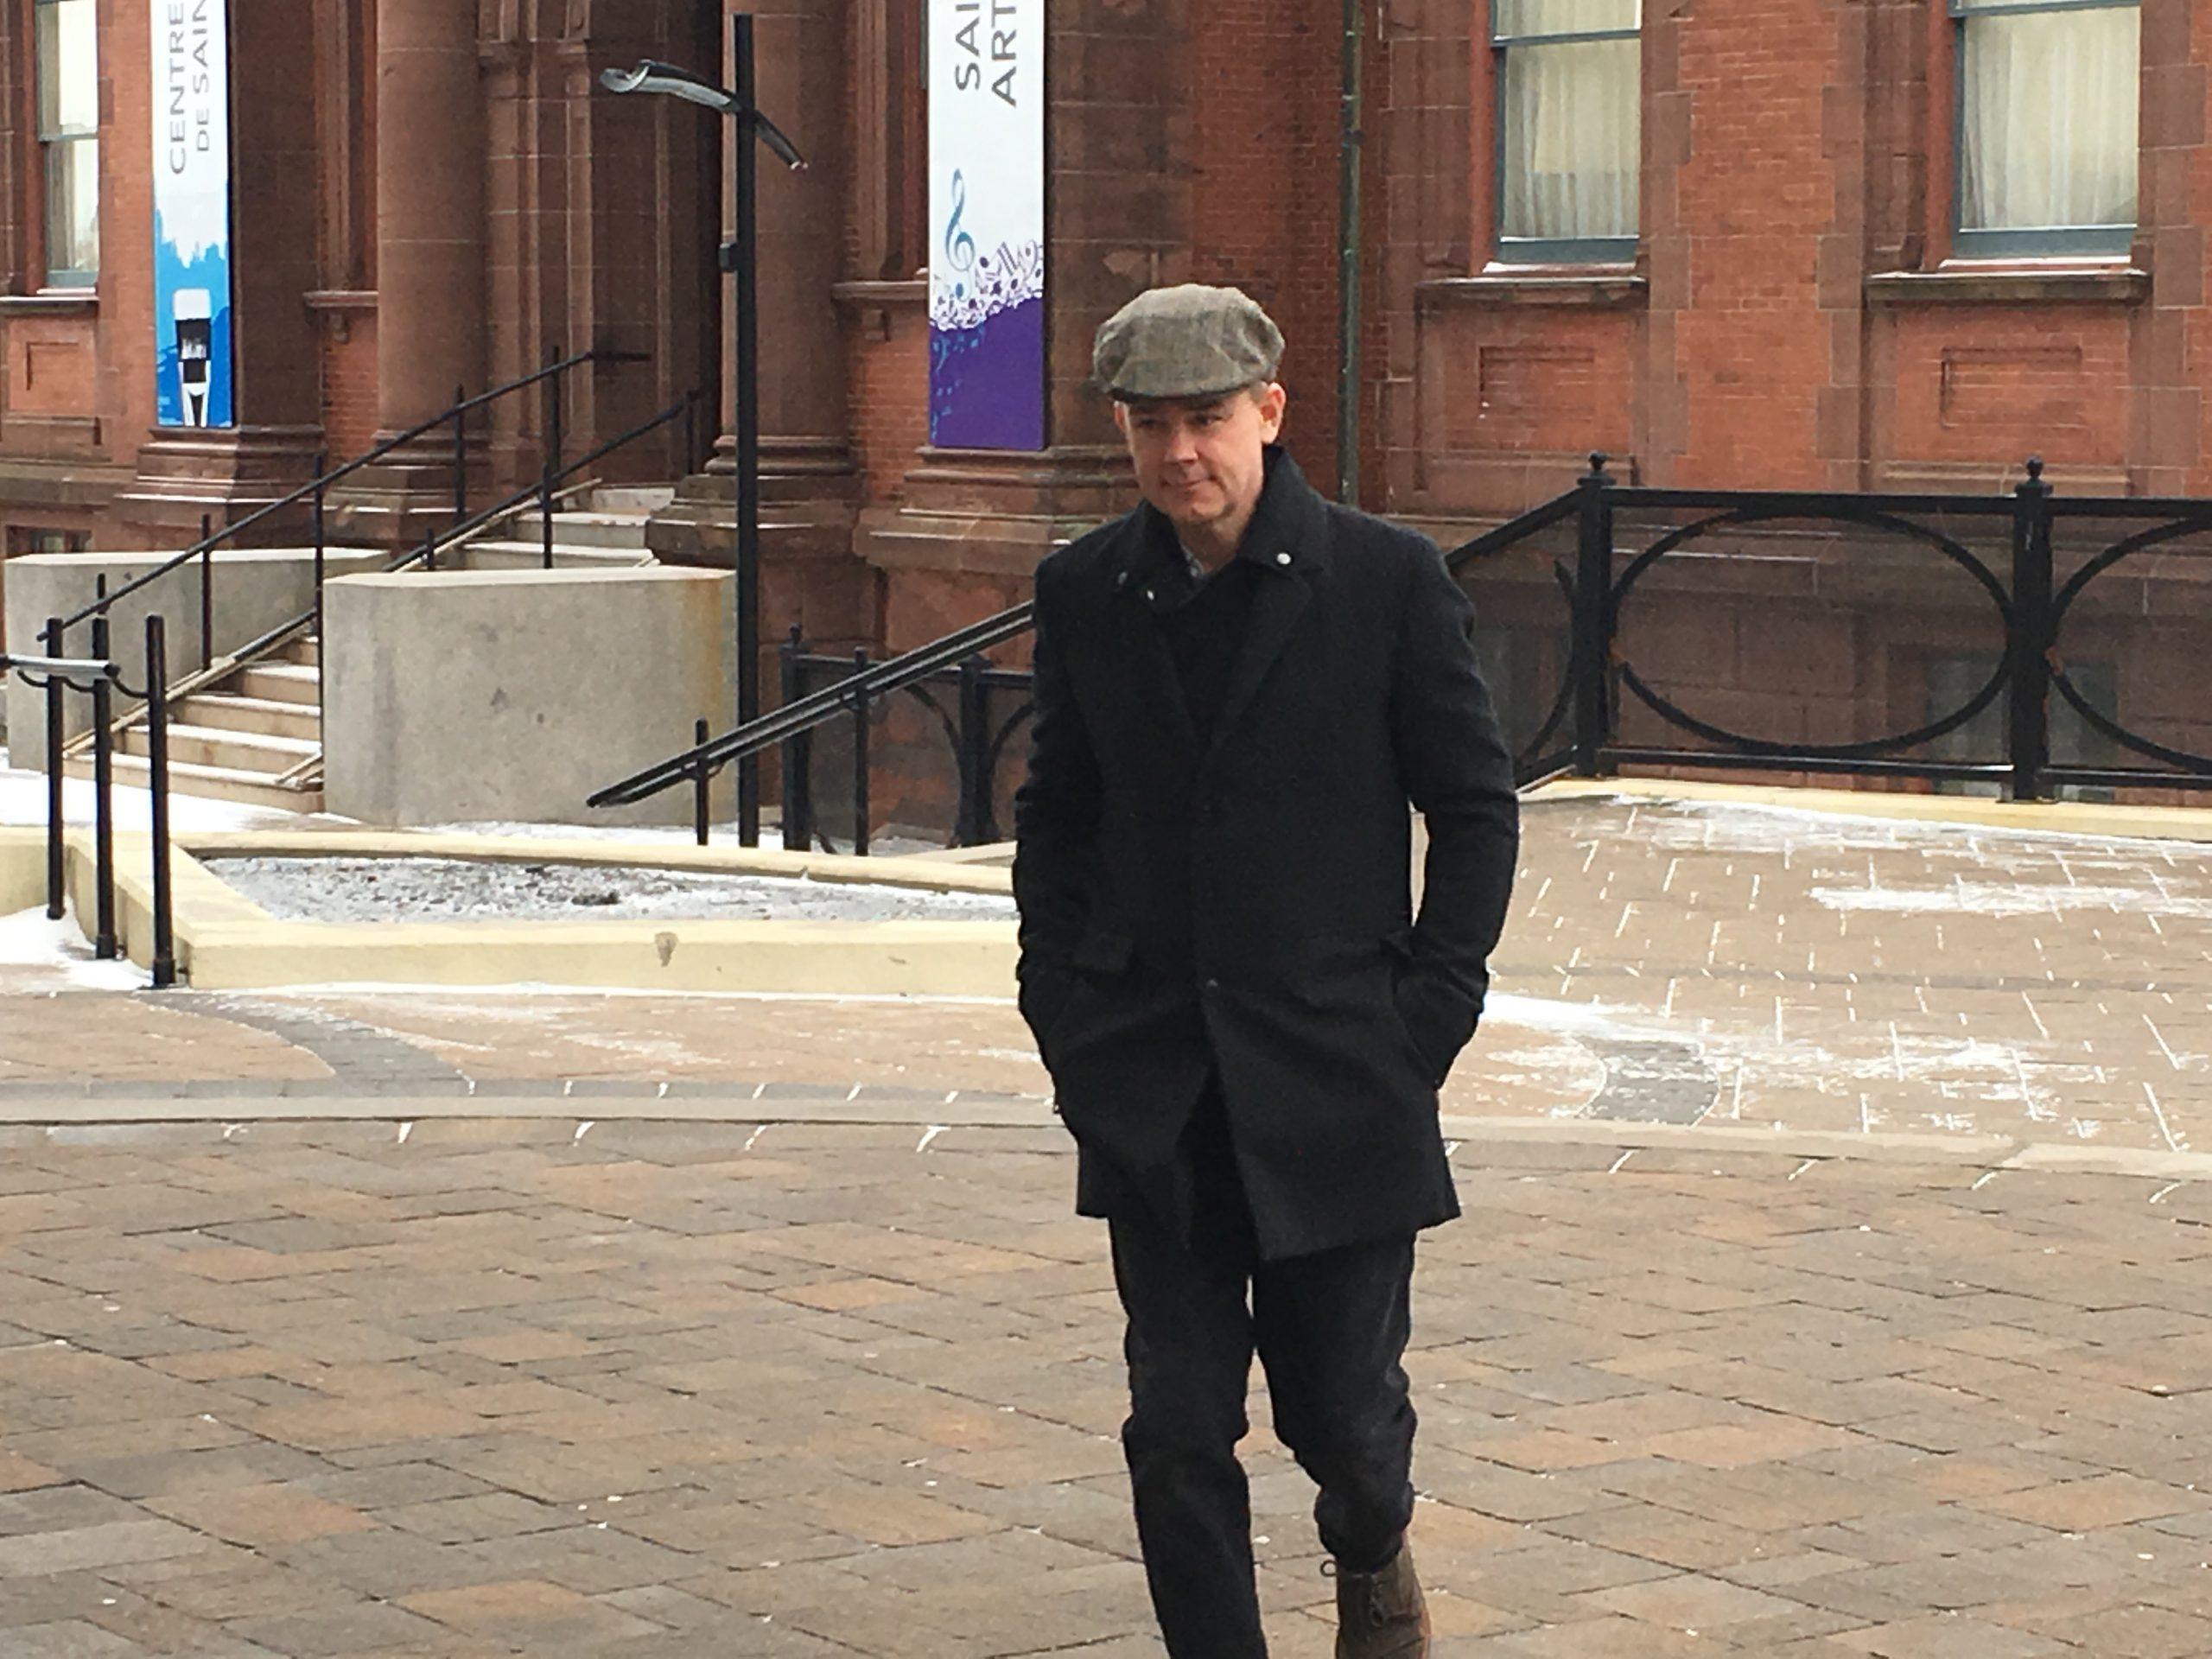 Oland Trial Delayed By 2 Weeks